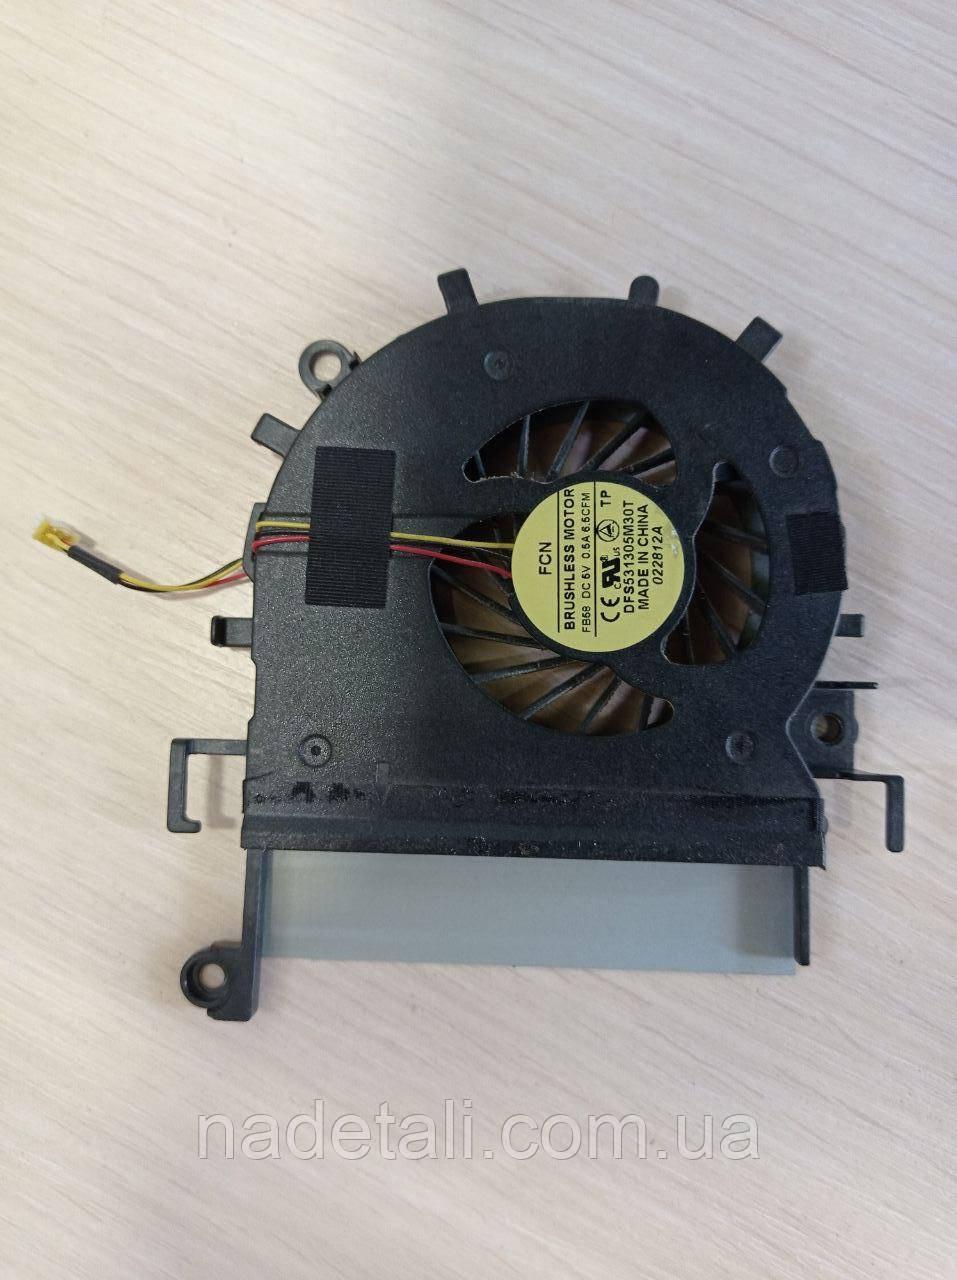 Вентилятор DFS531305M30T FCN 3pin